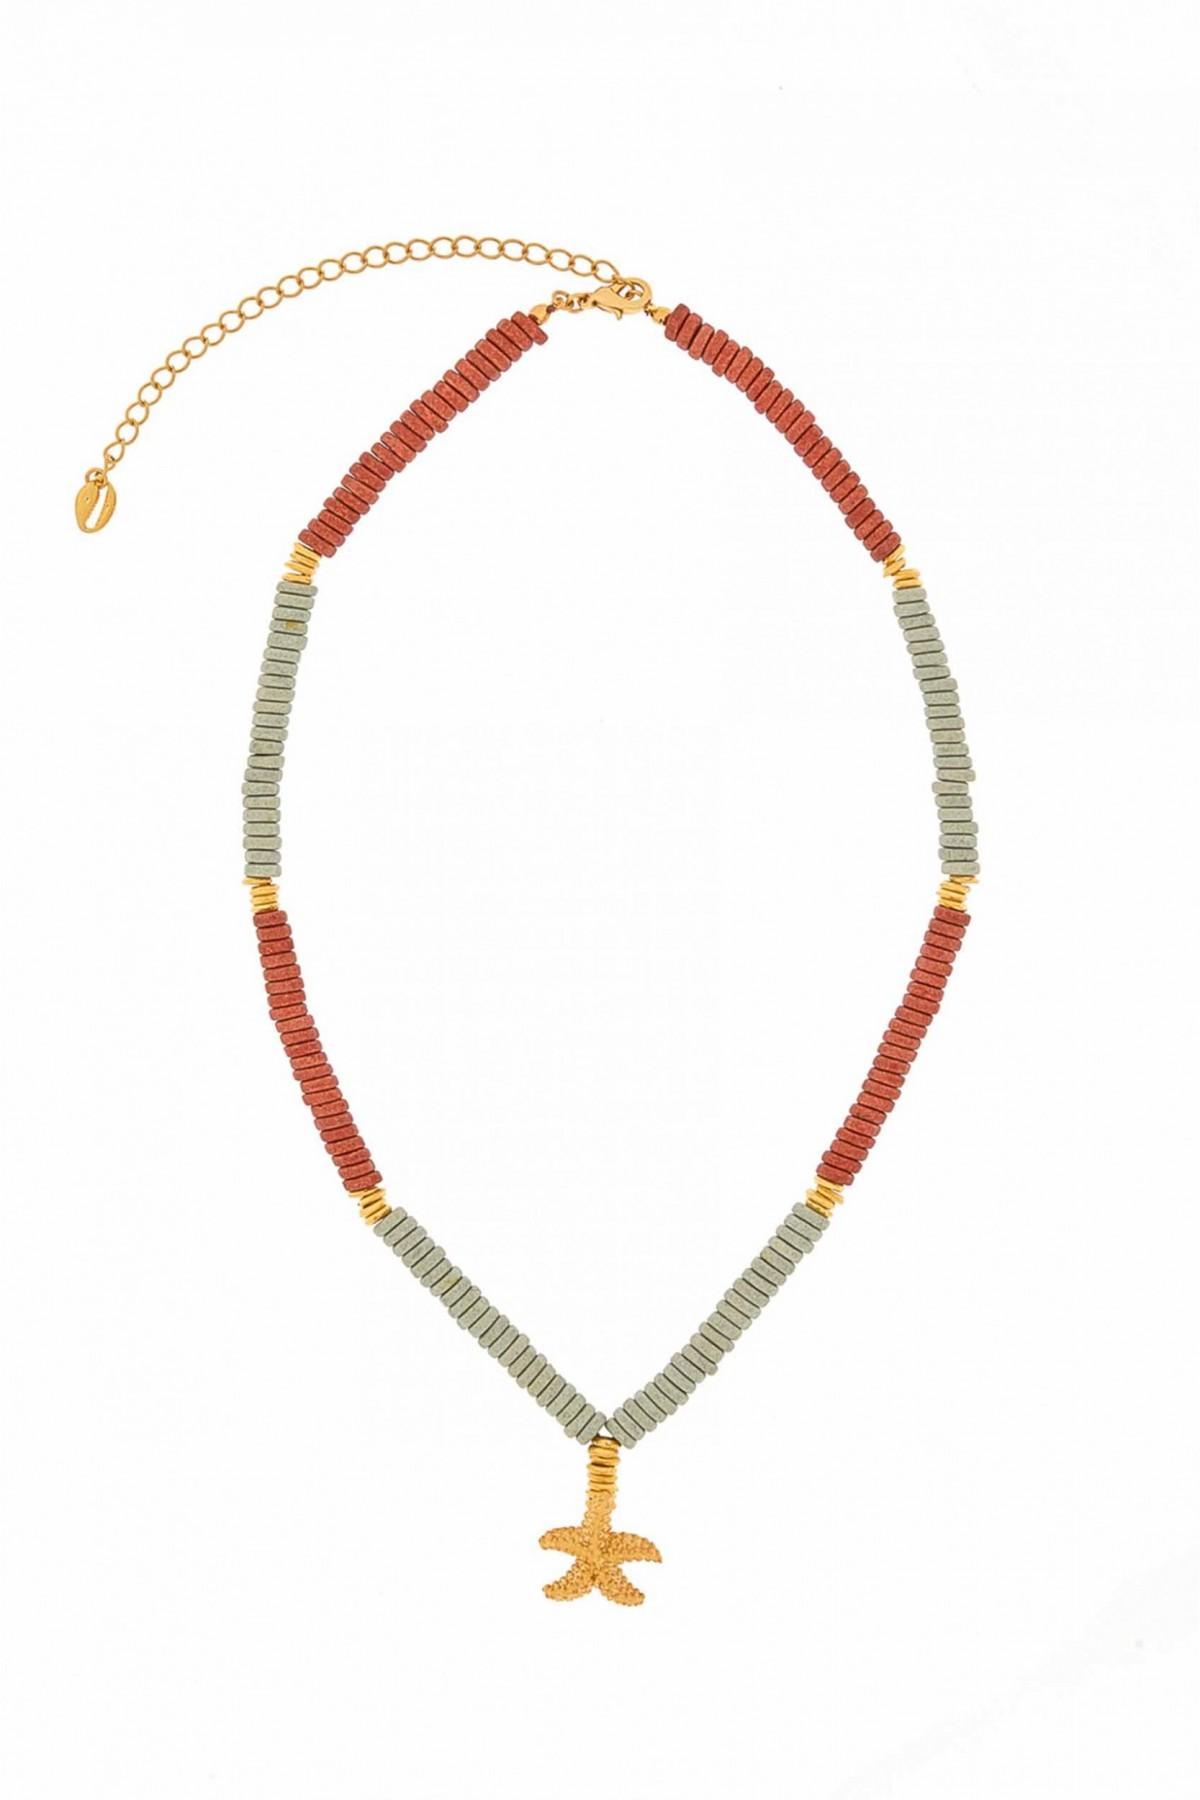 Seastar Necklace